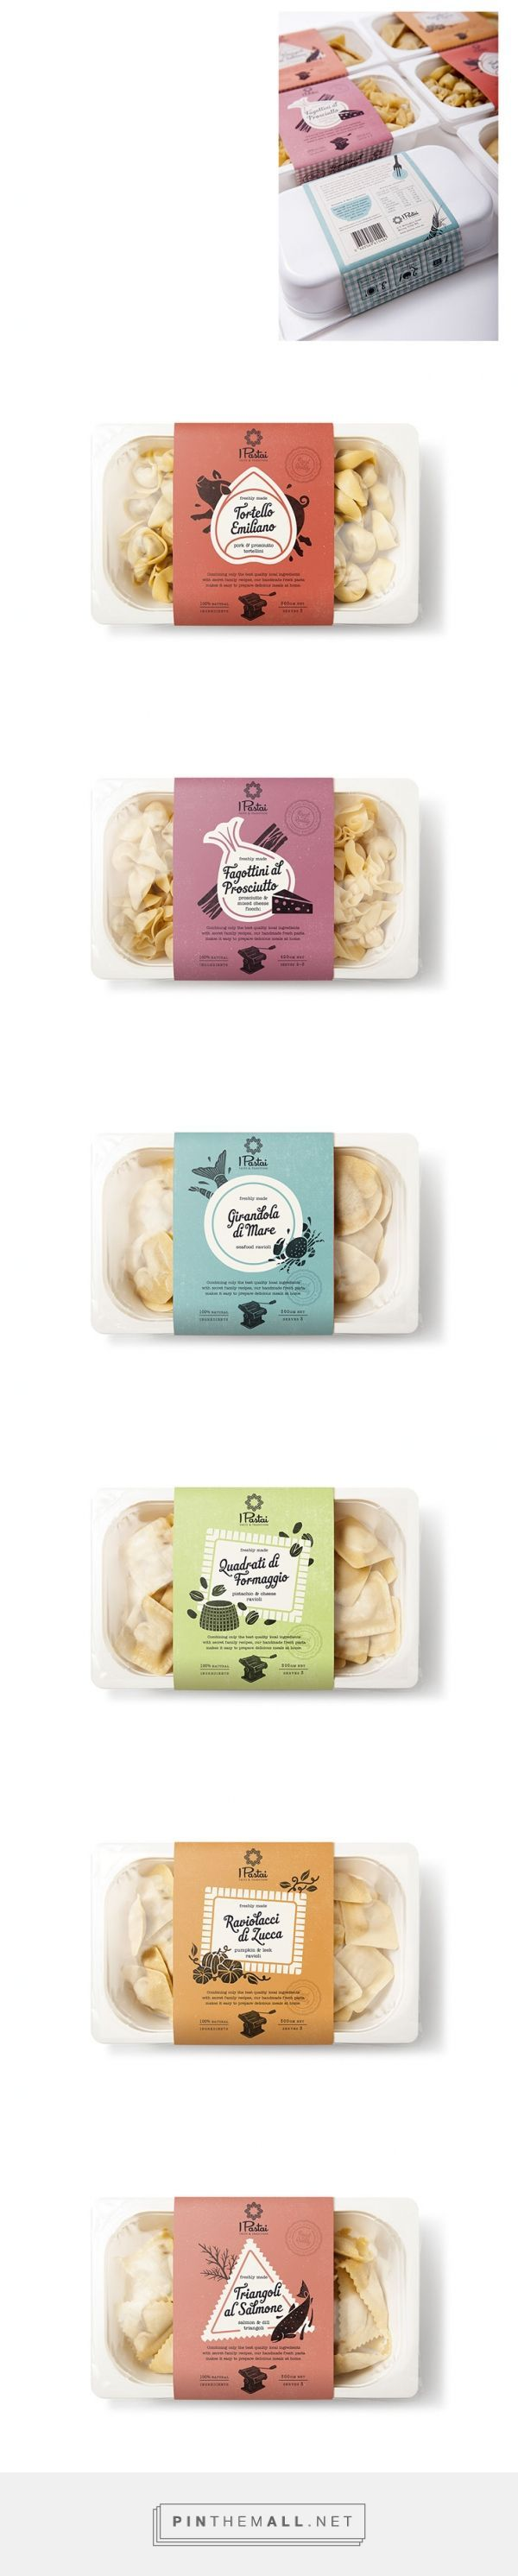 Pasta packaging design, food packaging   Dessein - created via